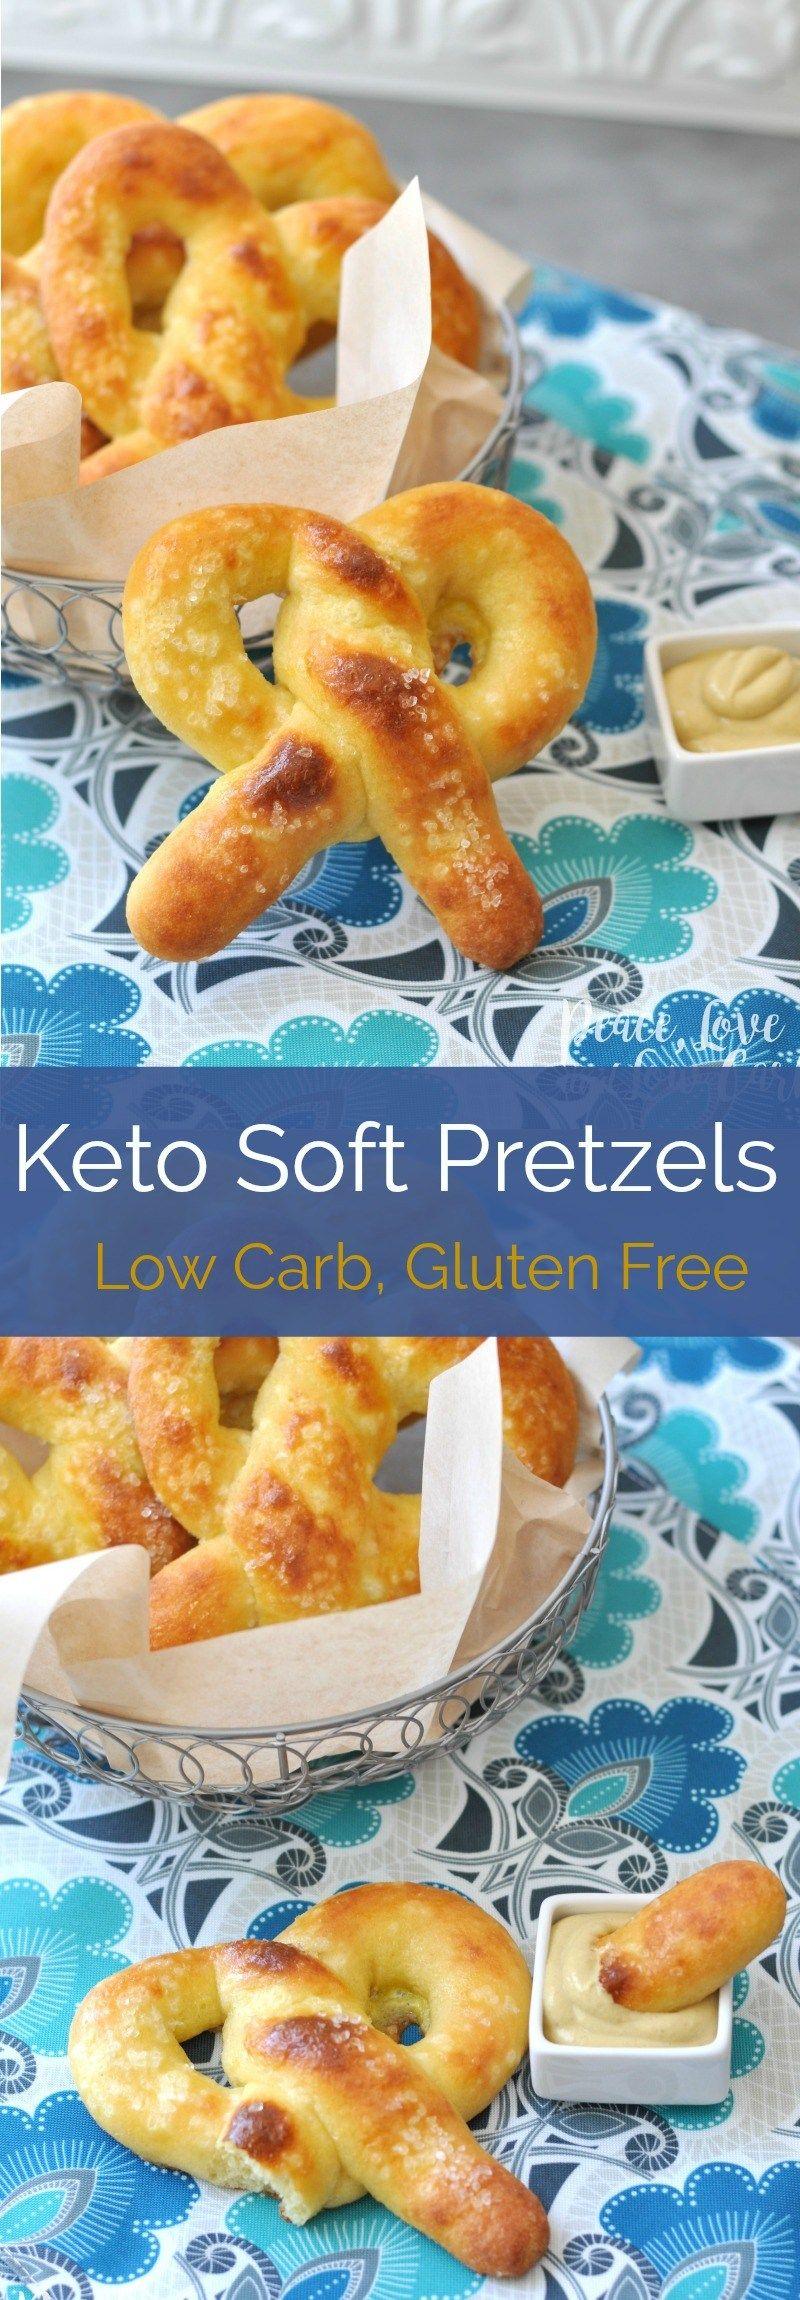 keto soft pretzel recipe protein packed recipes wls. Black Bedroom Furniture Sets. Home Design Ideas